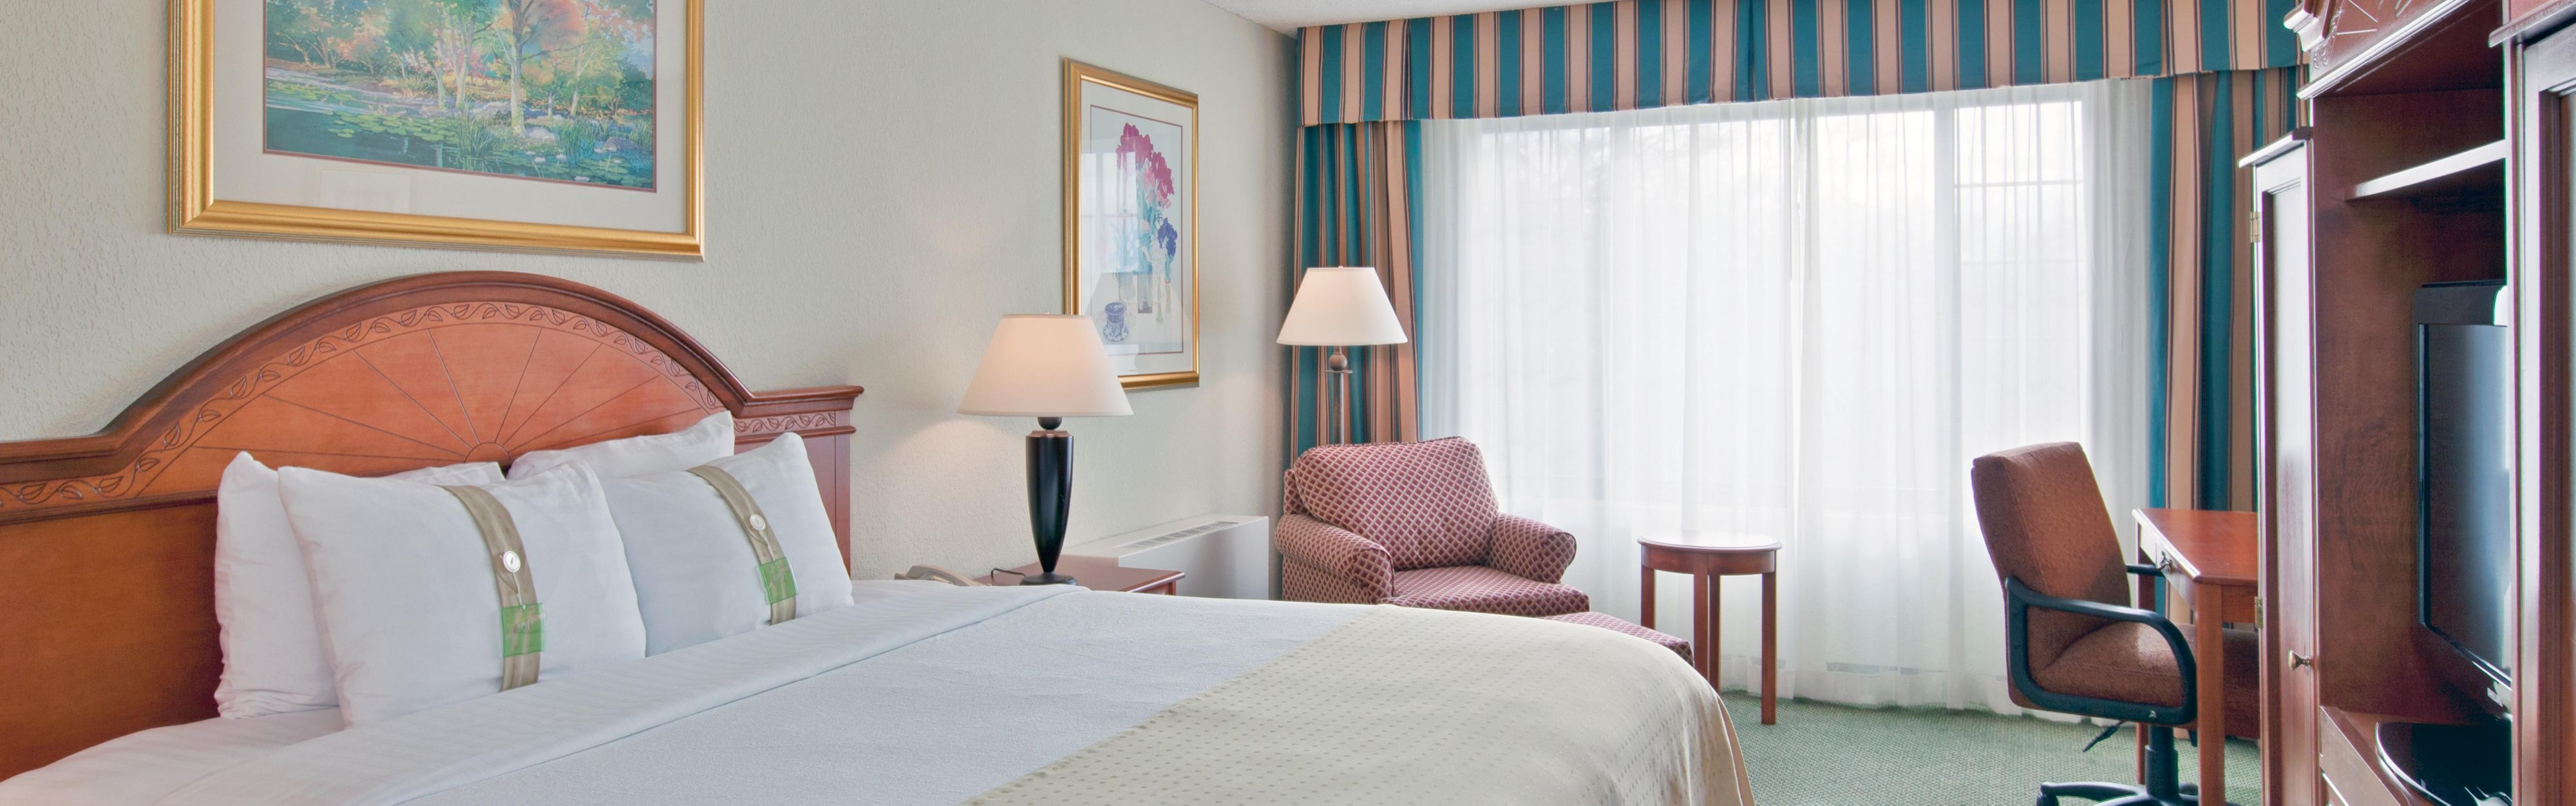 Holiday Inn Burlington image 1